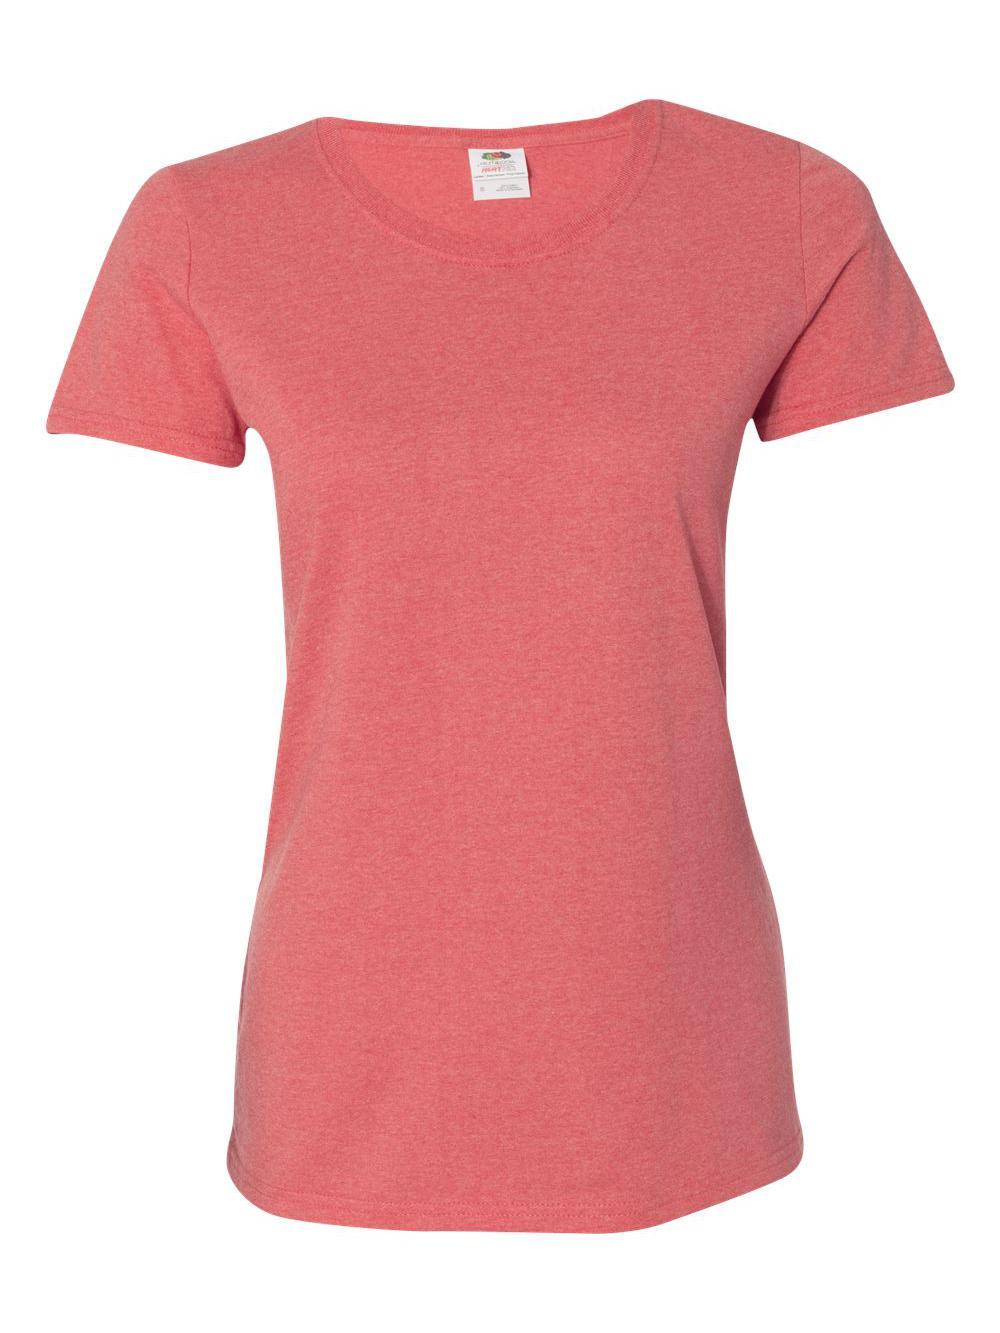 Fruit-of-the-Loom-HD-Cotton-Women-039-s-Short-Sleeve-T-Shirt-L3930R thumbnail 24